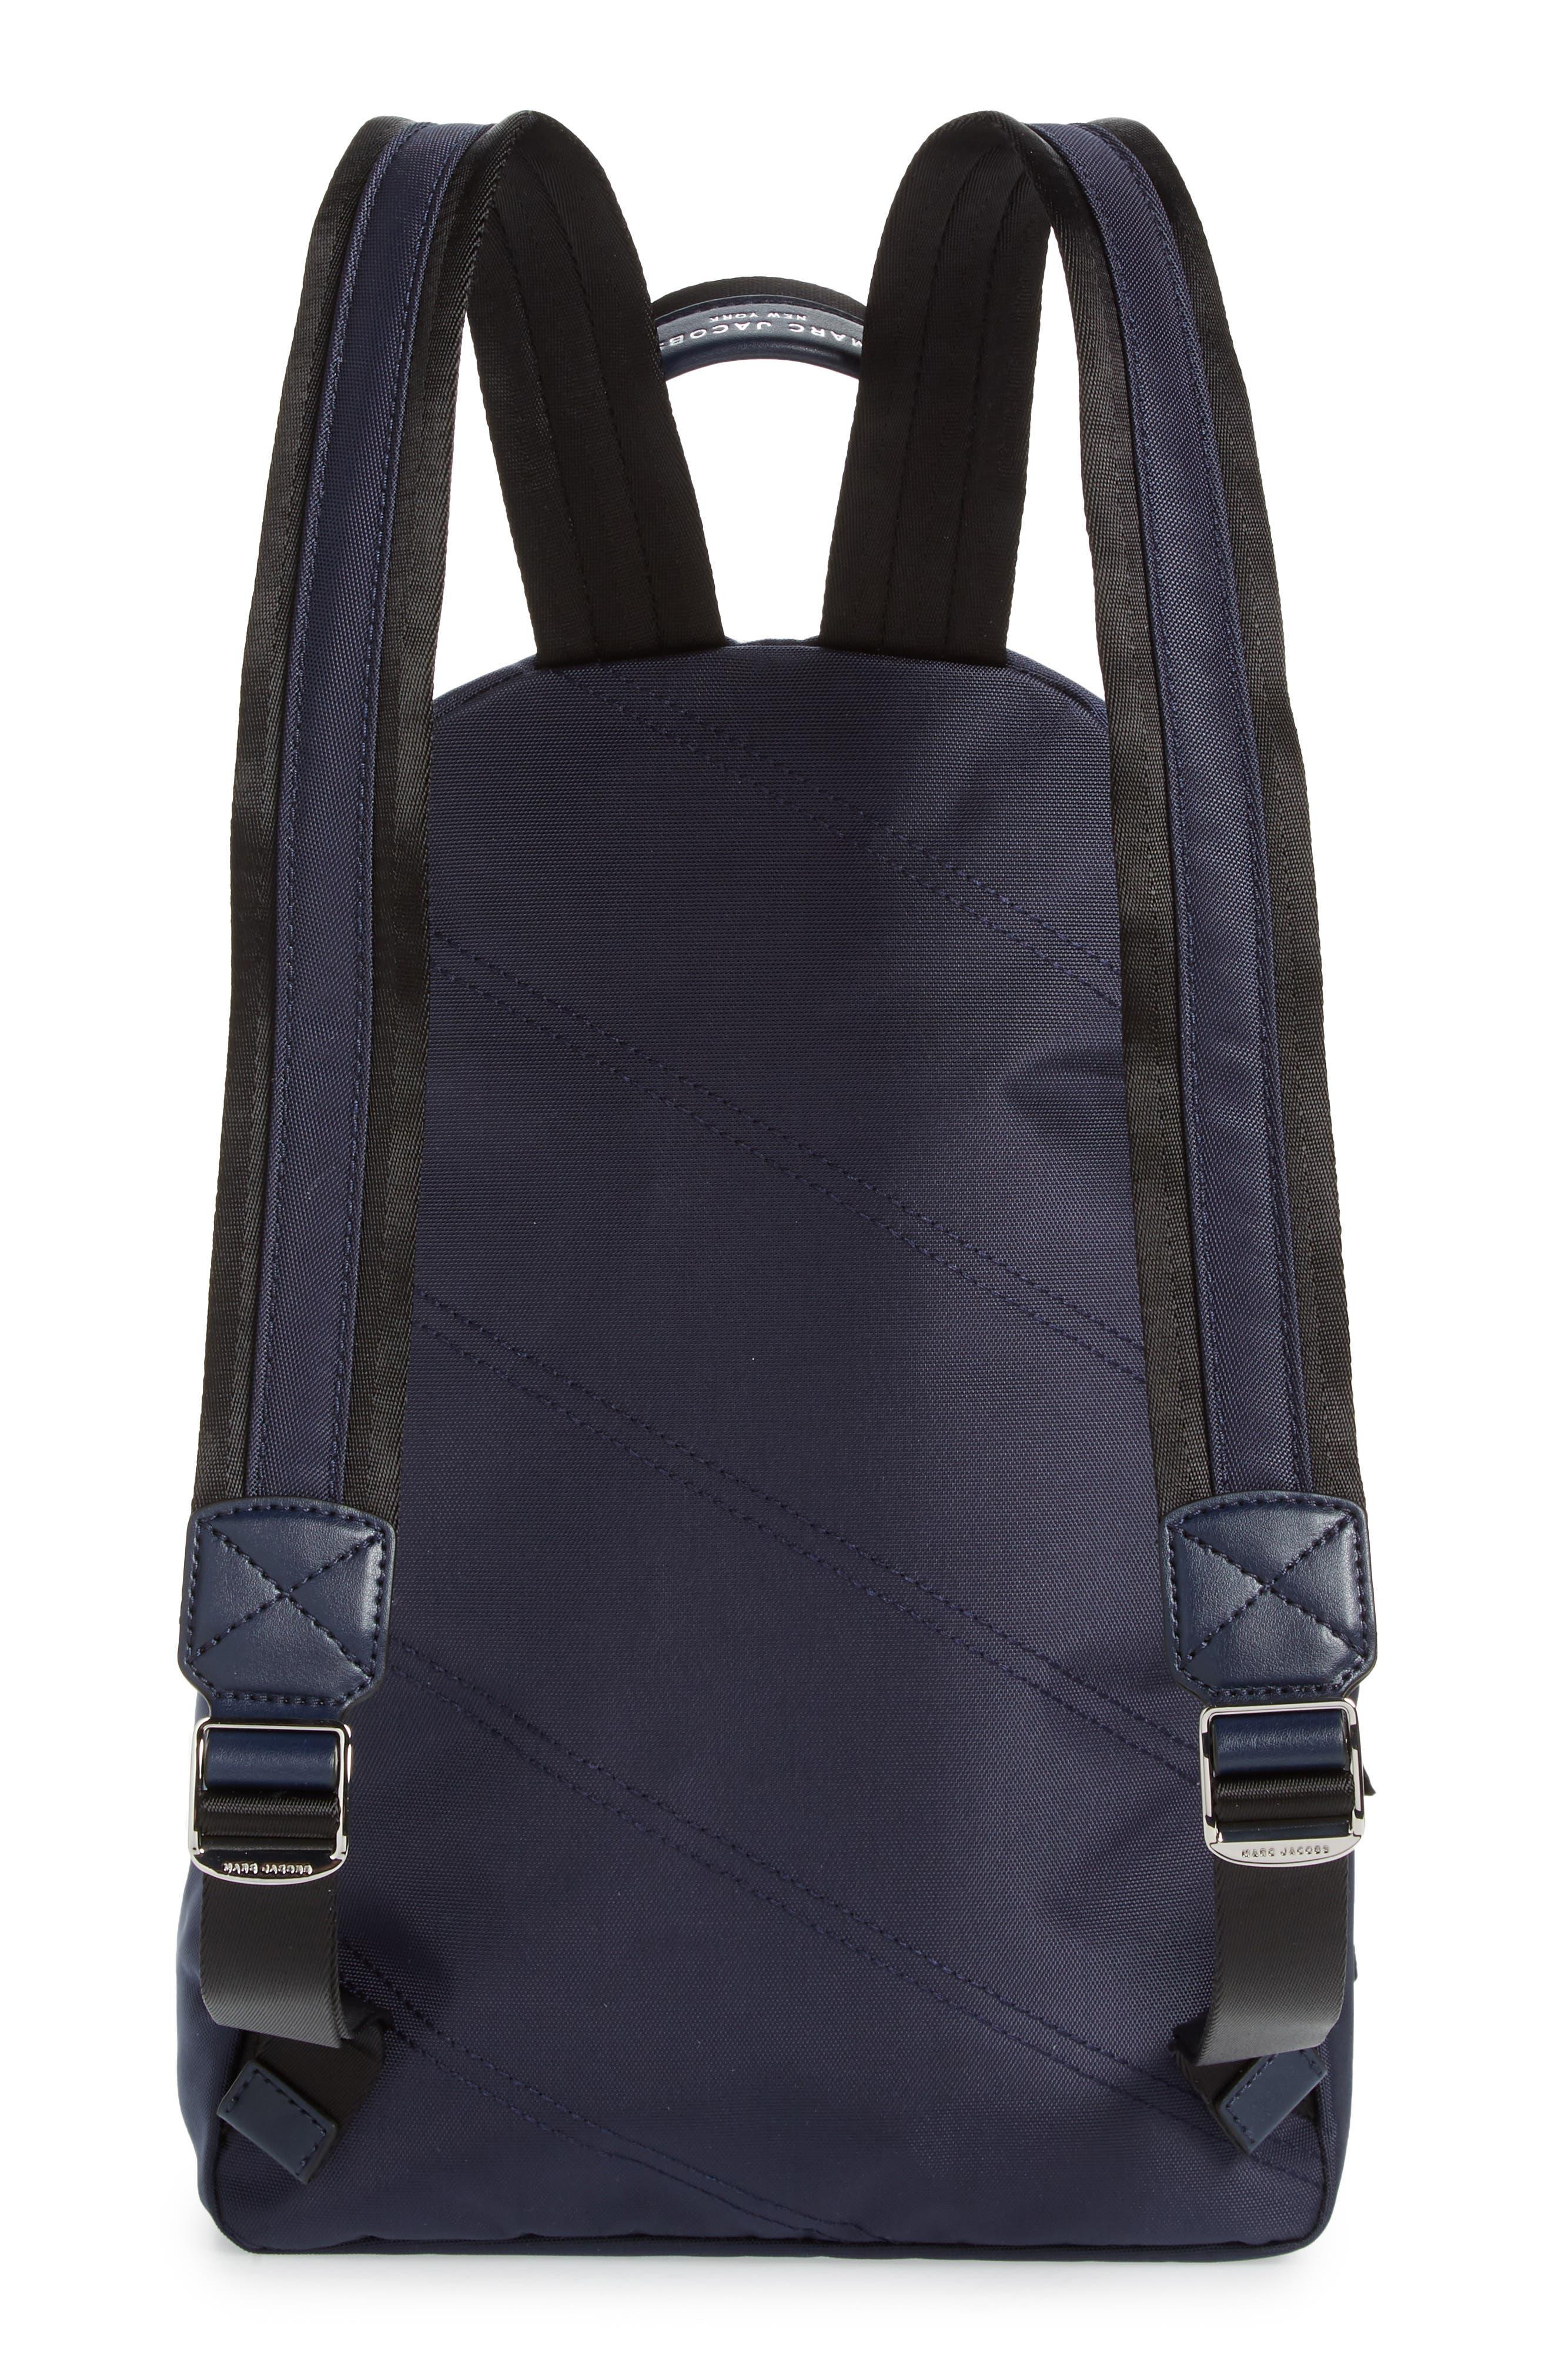 Medium Trek Nylon Backpack,                             Alternate thumbnail 3, color,                             MIDNIGHT BLUE